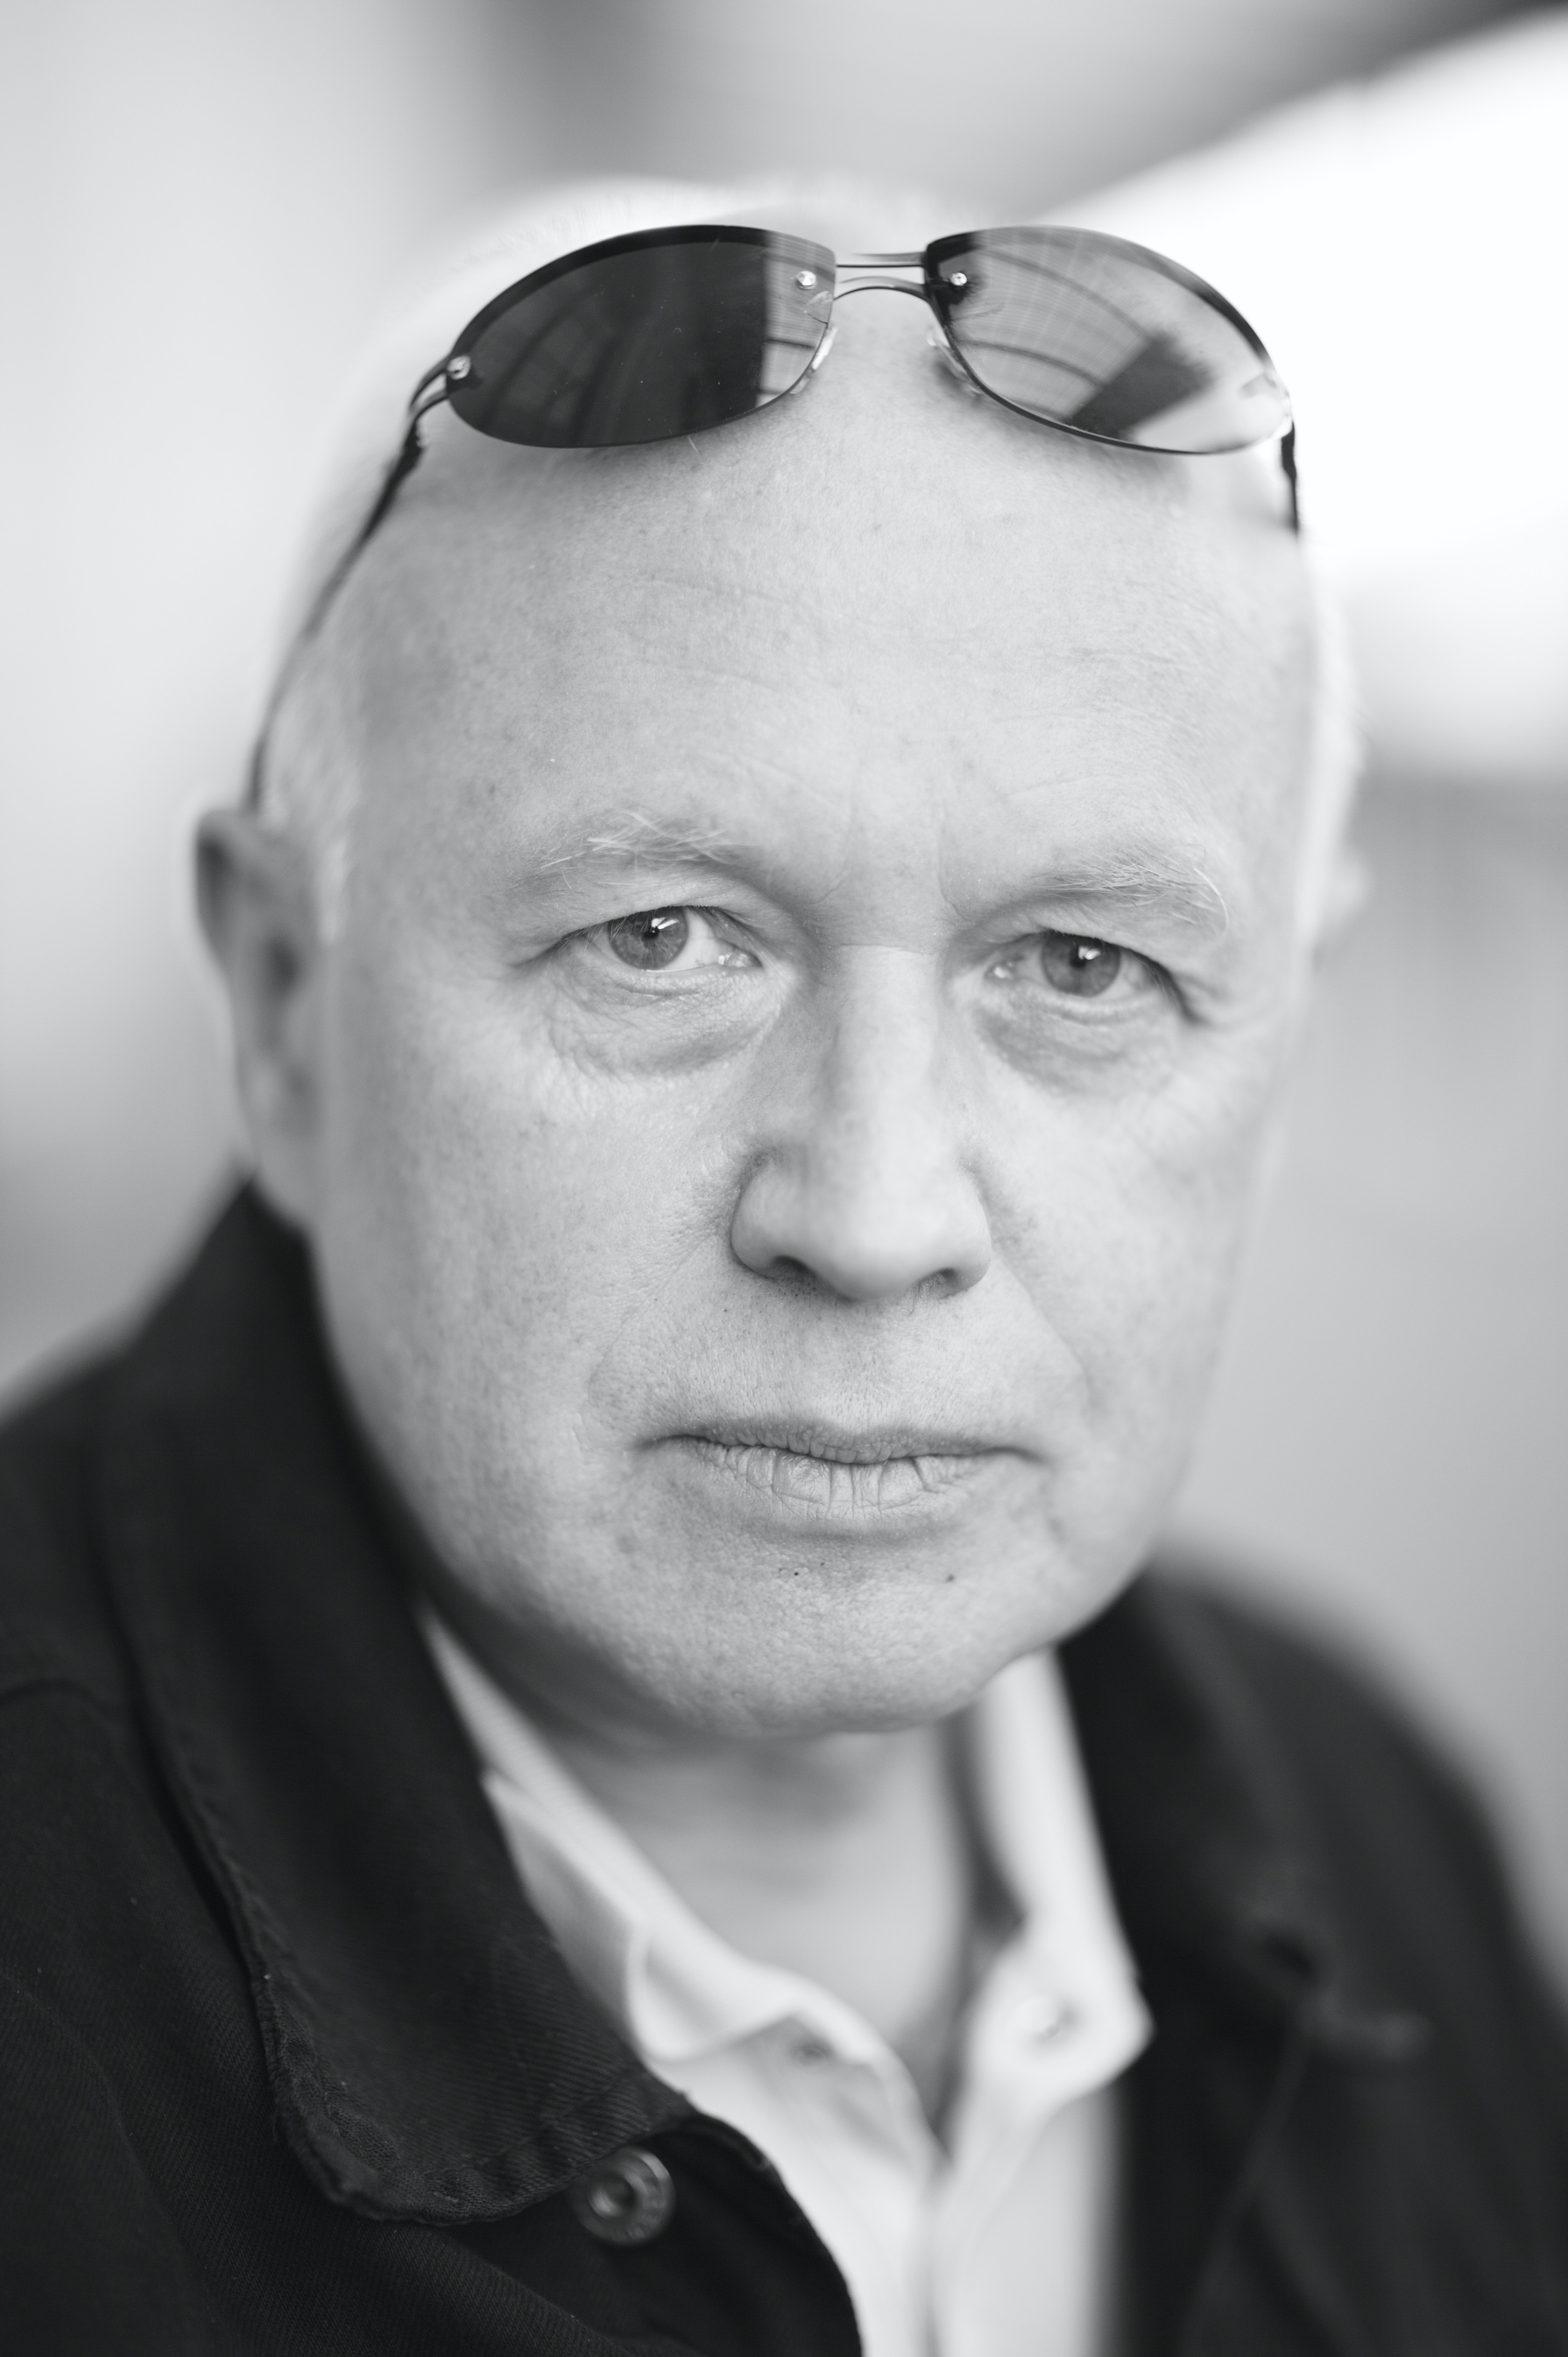 Aleksandras Kapustinas